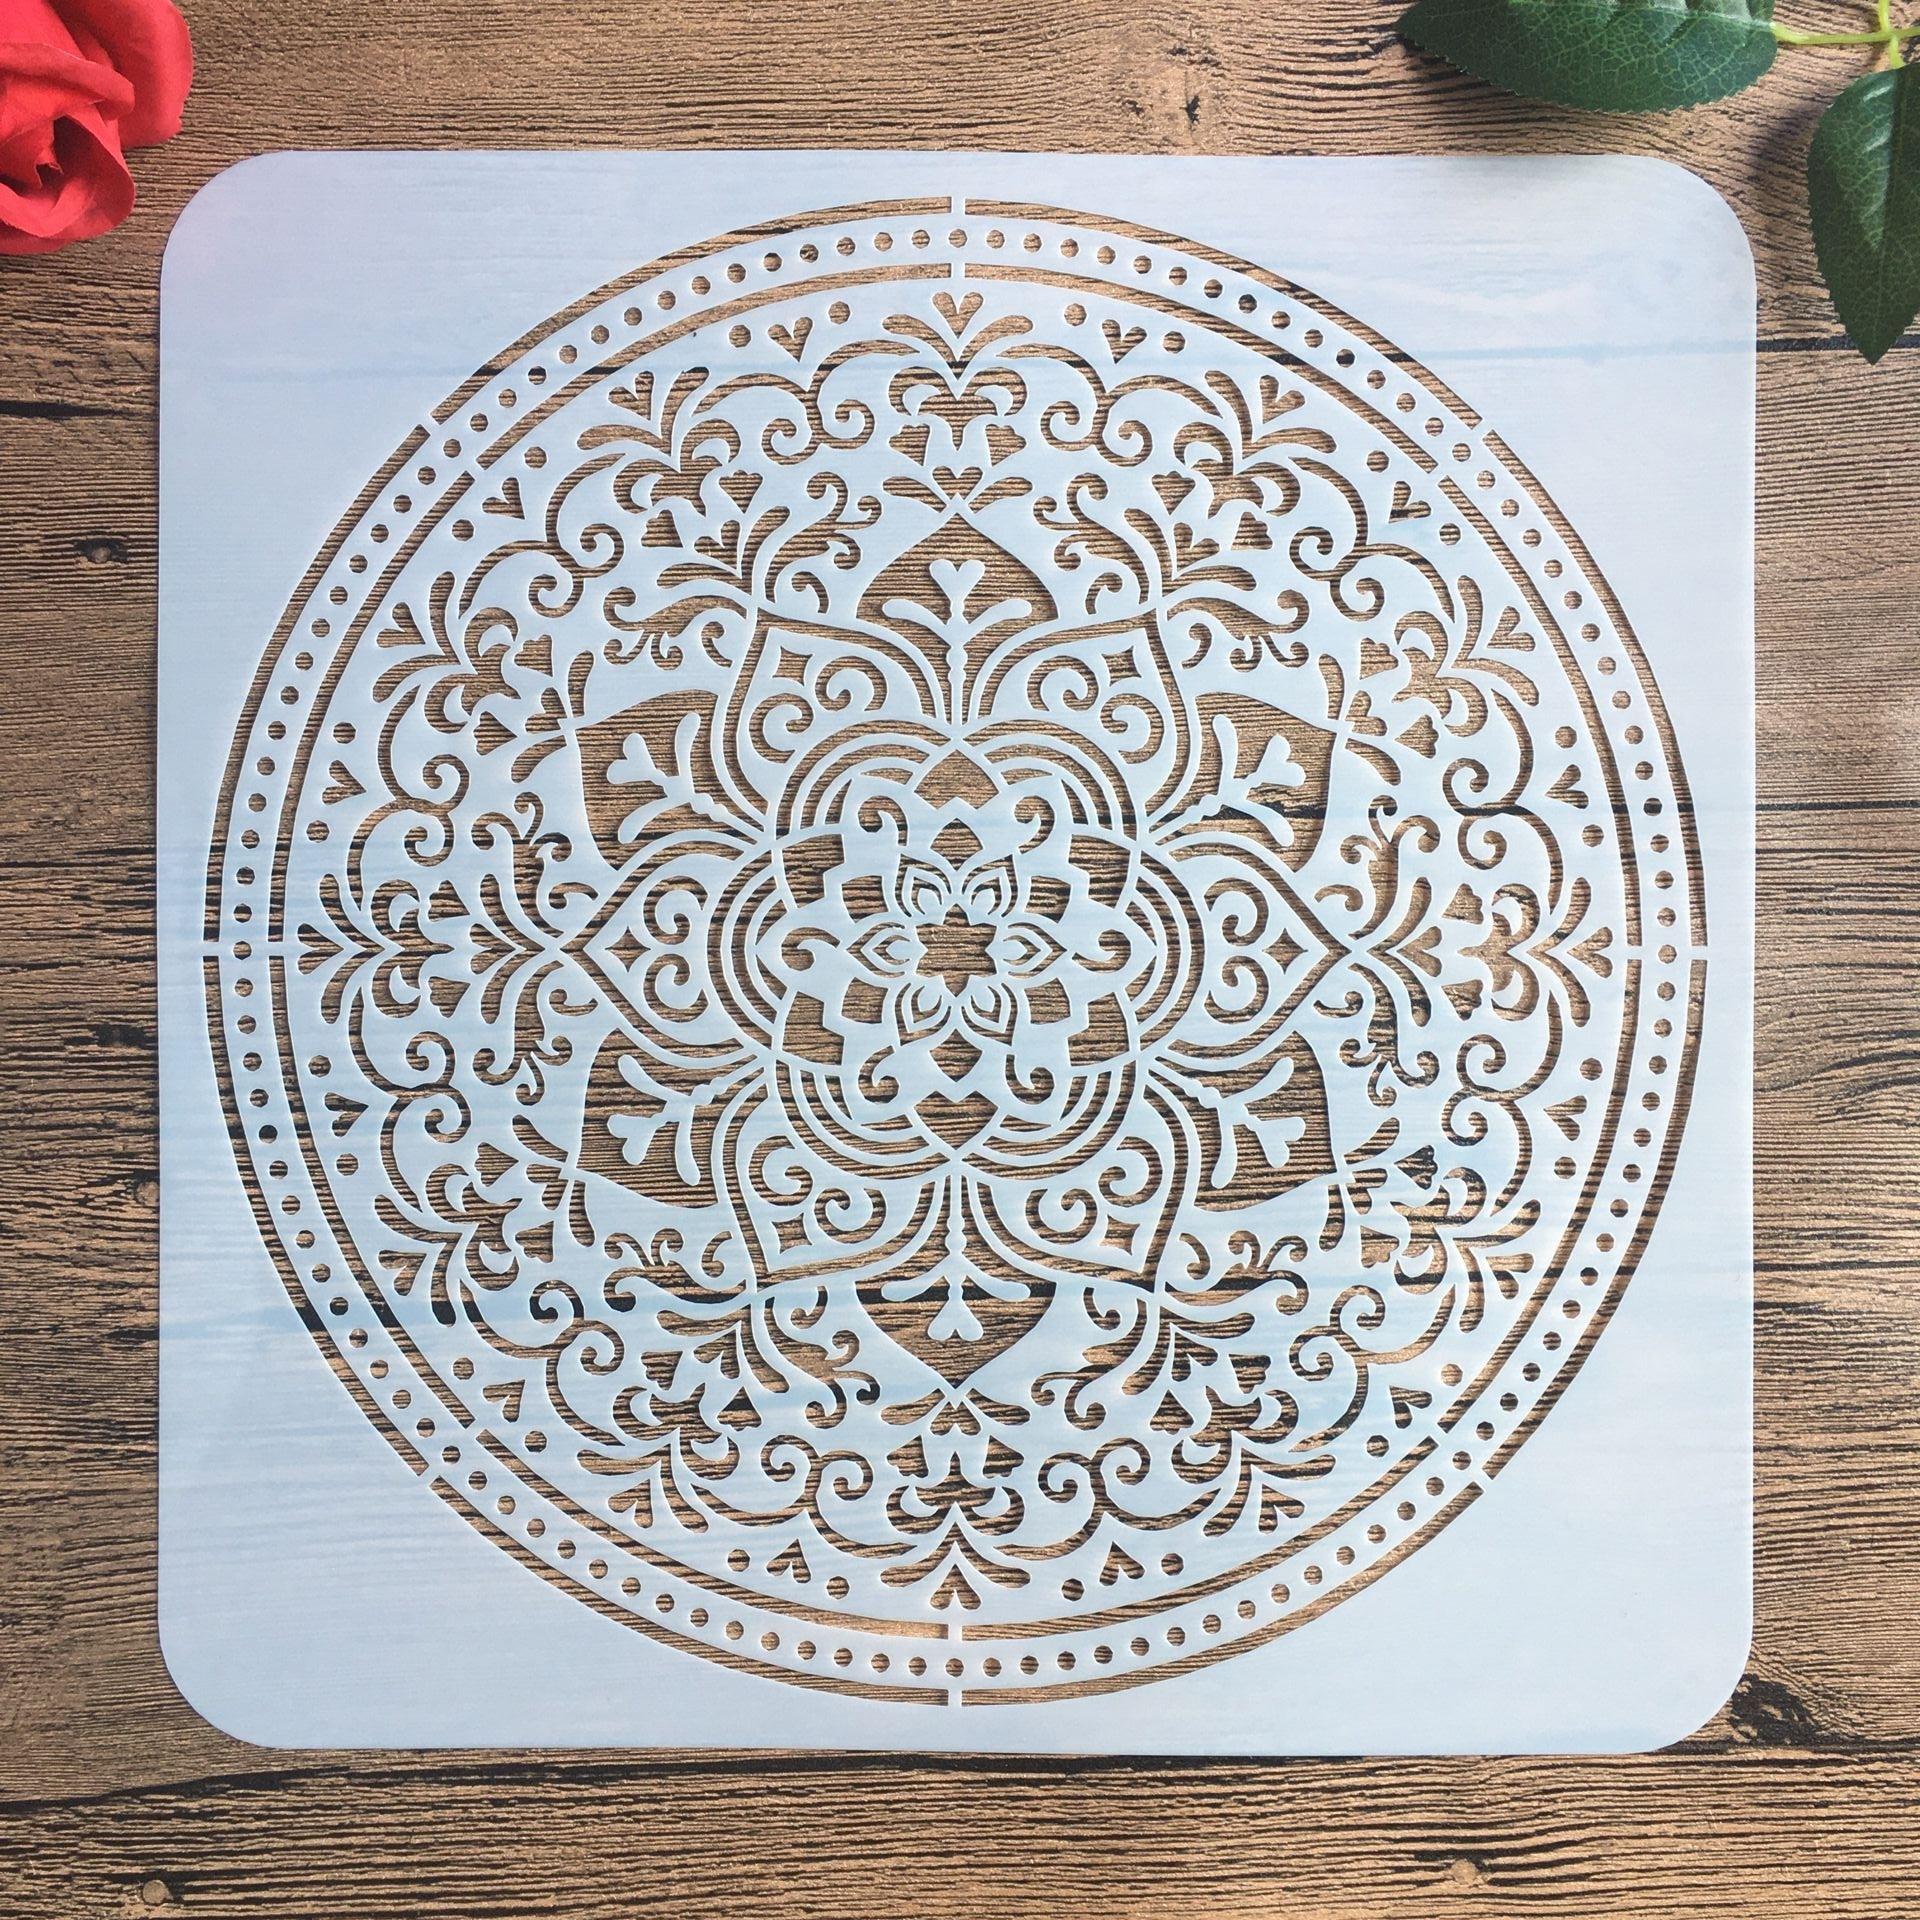 30 * 30 Cm Large Round Flower Mandala Diy Stencil Painting Scrapbook Coloring Engraving Album Decoration Template Stencil -i